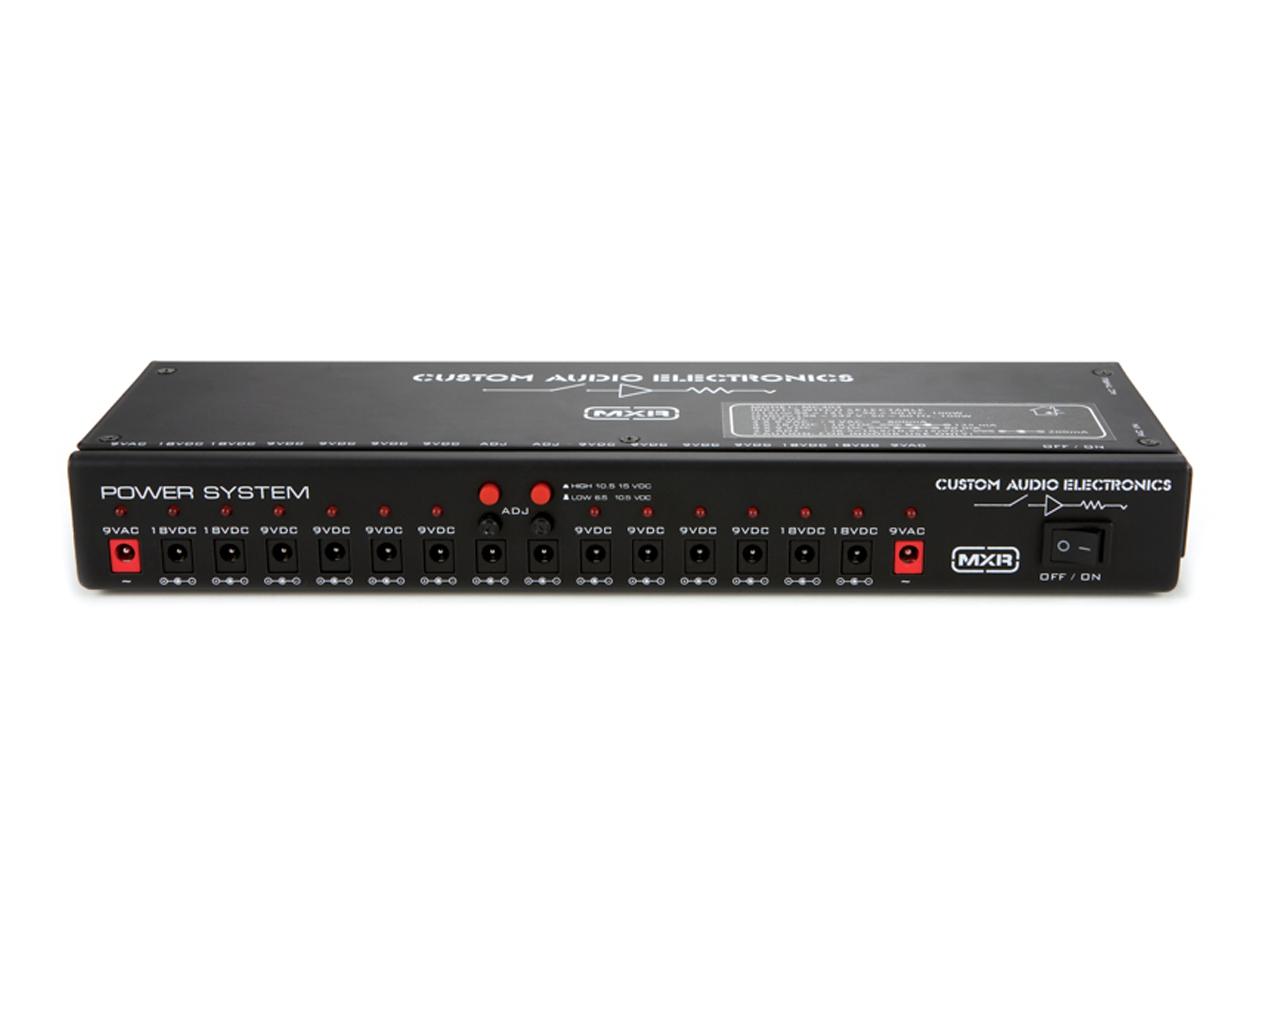 Fonte Mxr Cae Power System P/16 Pedais Cabo Ac Mc403 Dunlop  - Audio Video & cia